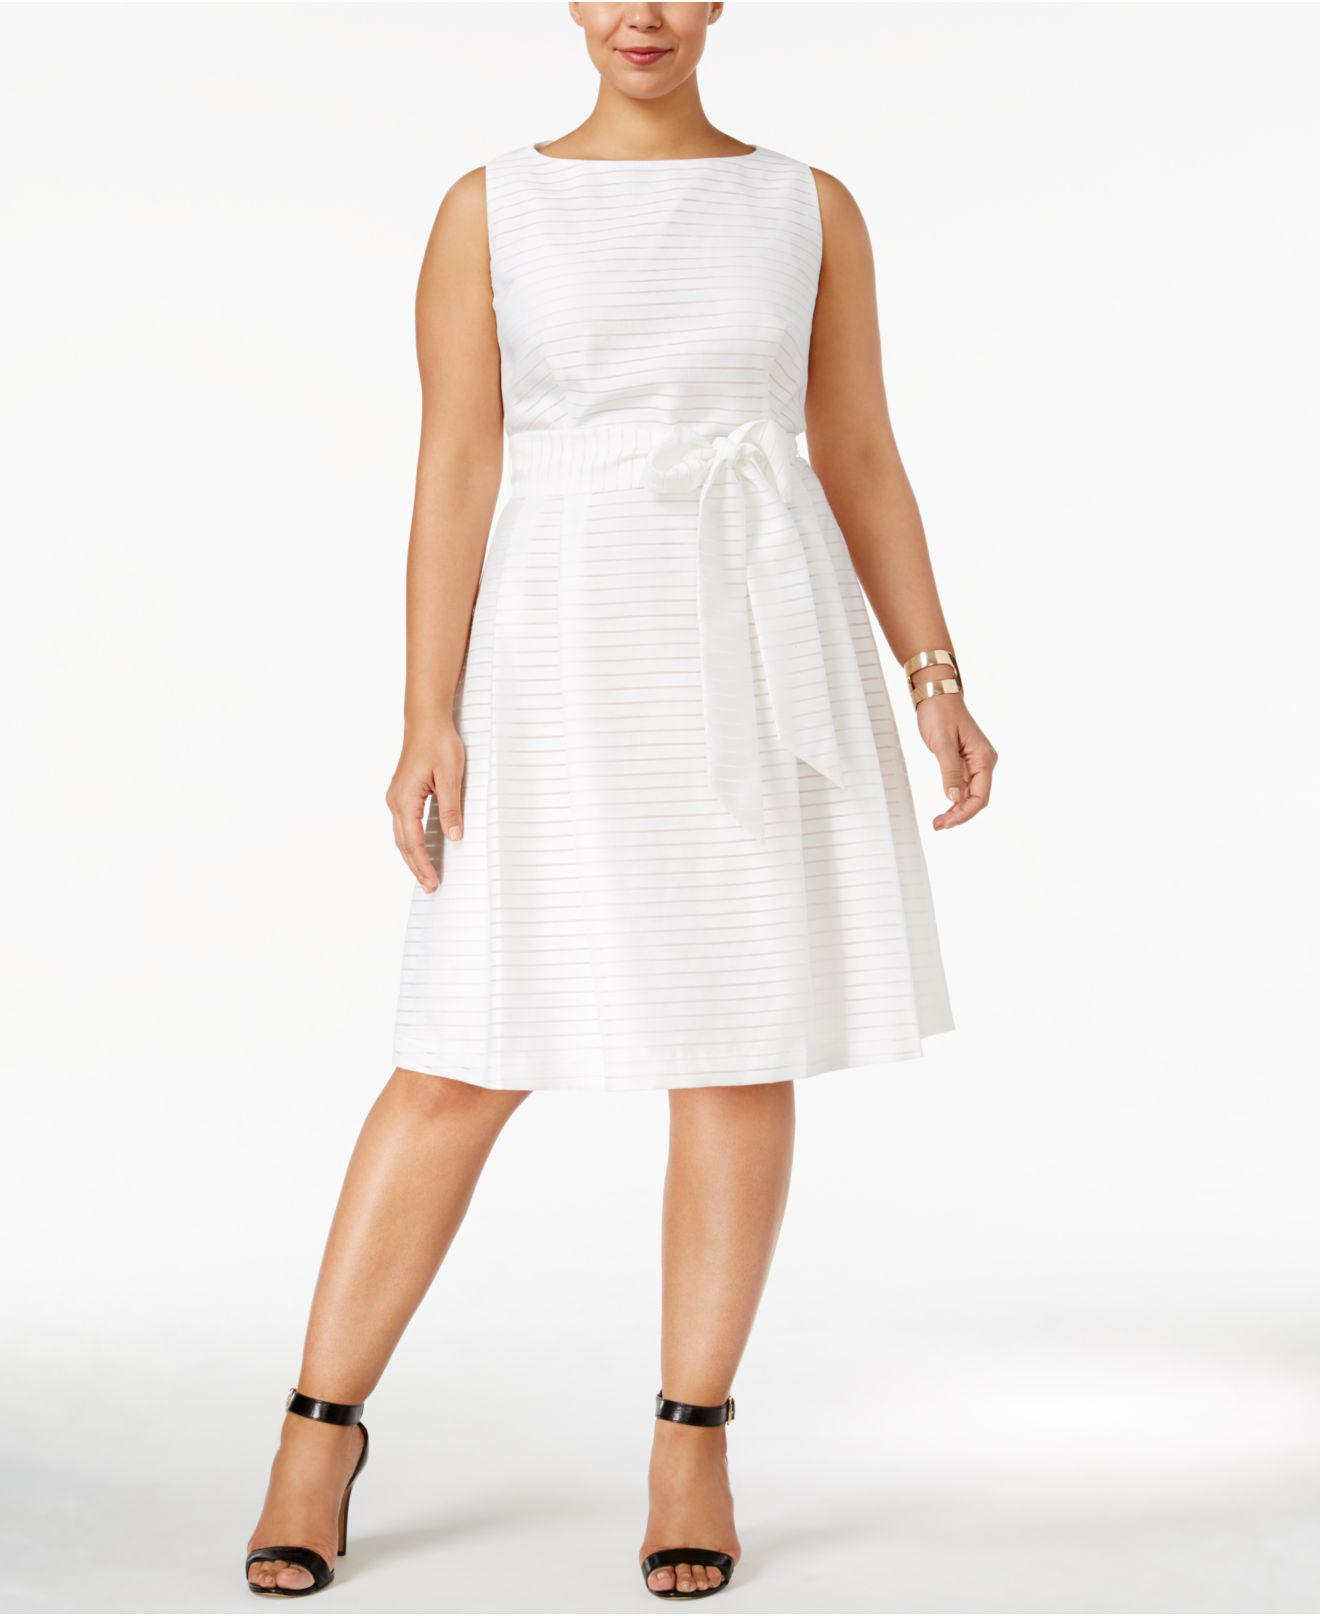 039ddba8fcf Lyst - Anne Klein Plus Size Shadow-striped Fit   Flare Dress in White